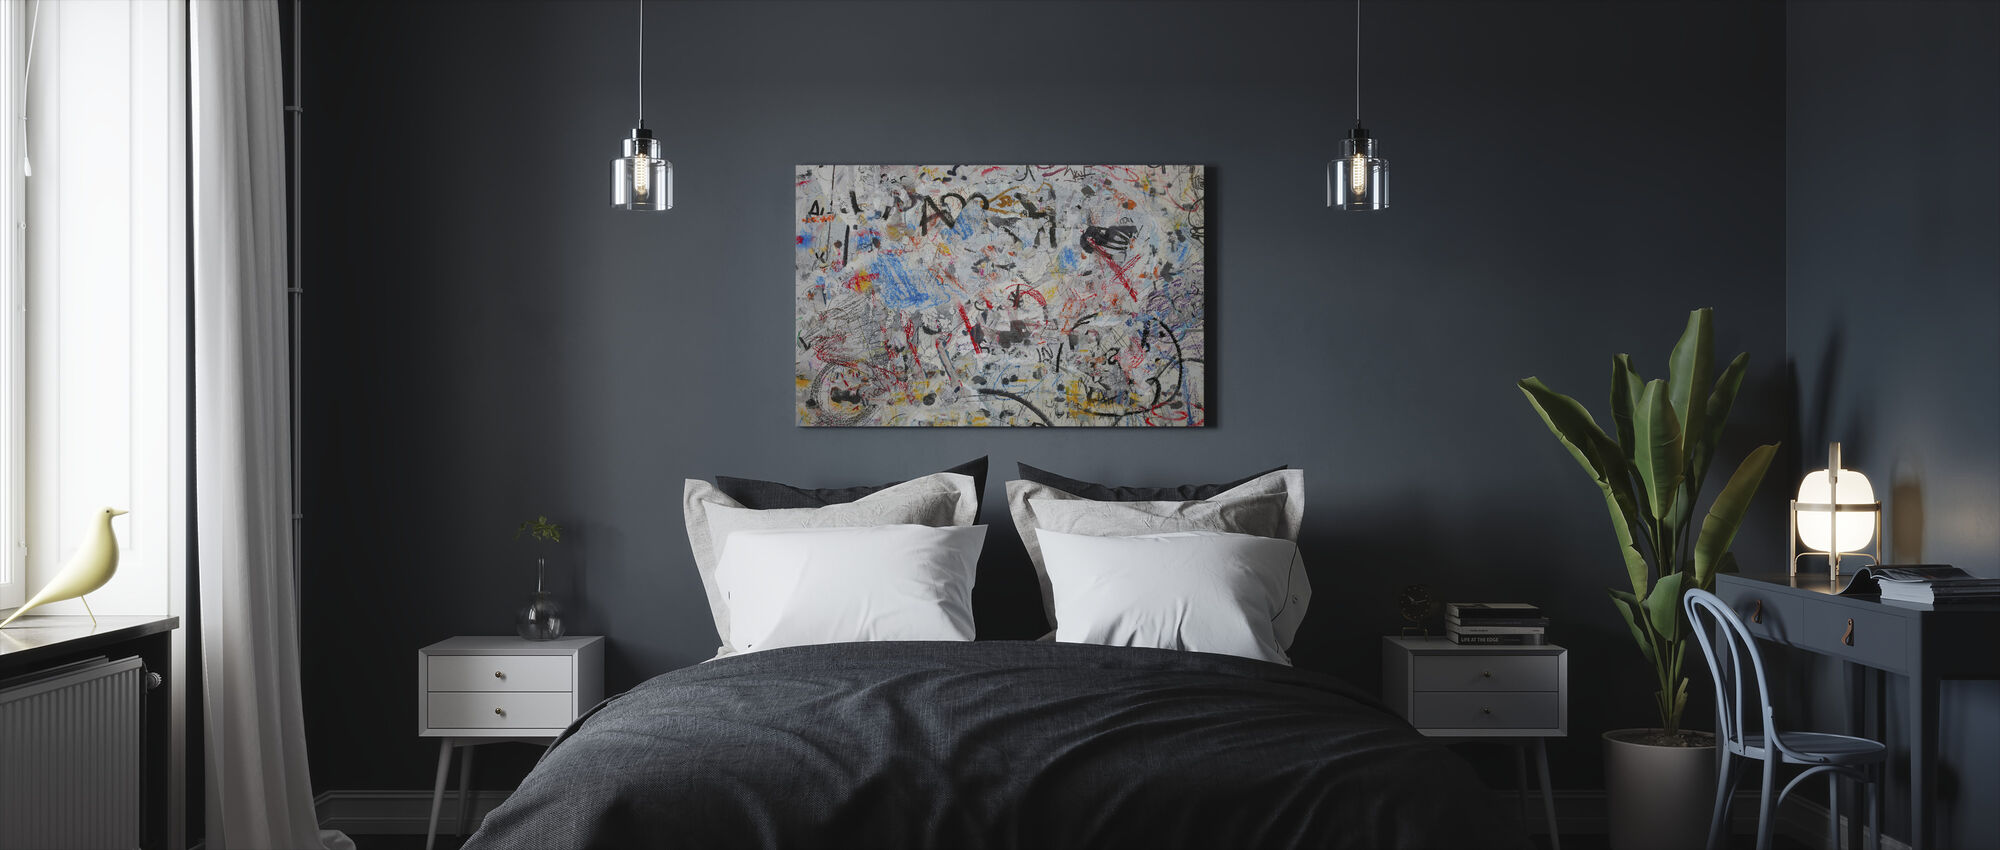 Grunge Graffiti Muur - Canvas print - Slaapkamer